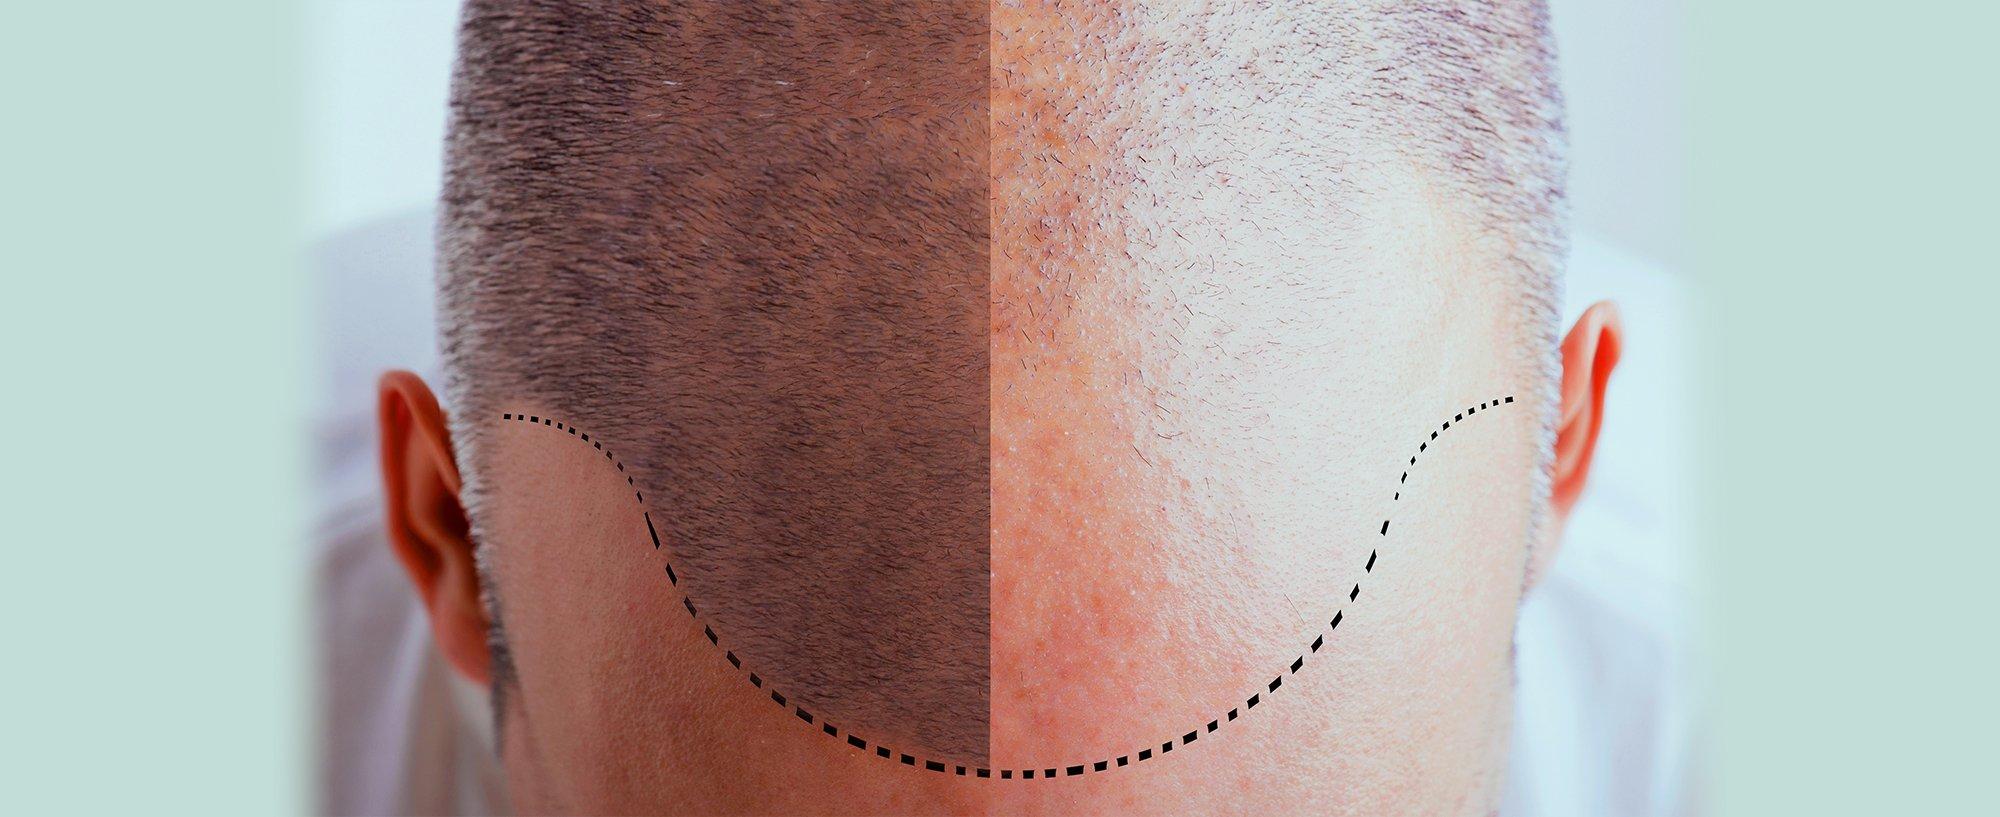 Transplantacija kose najsavremenijom metodom